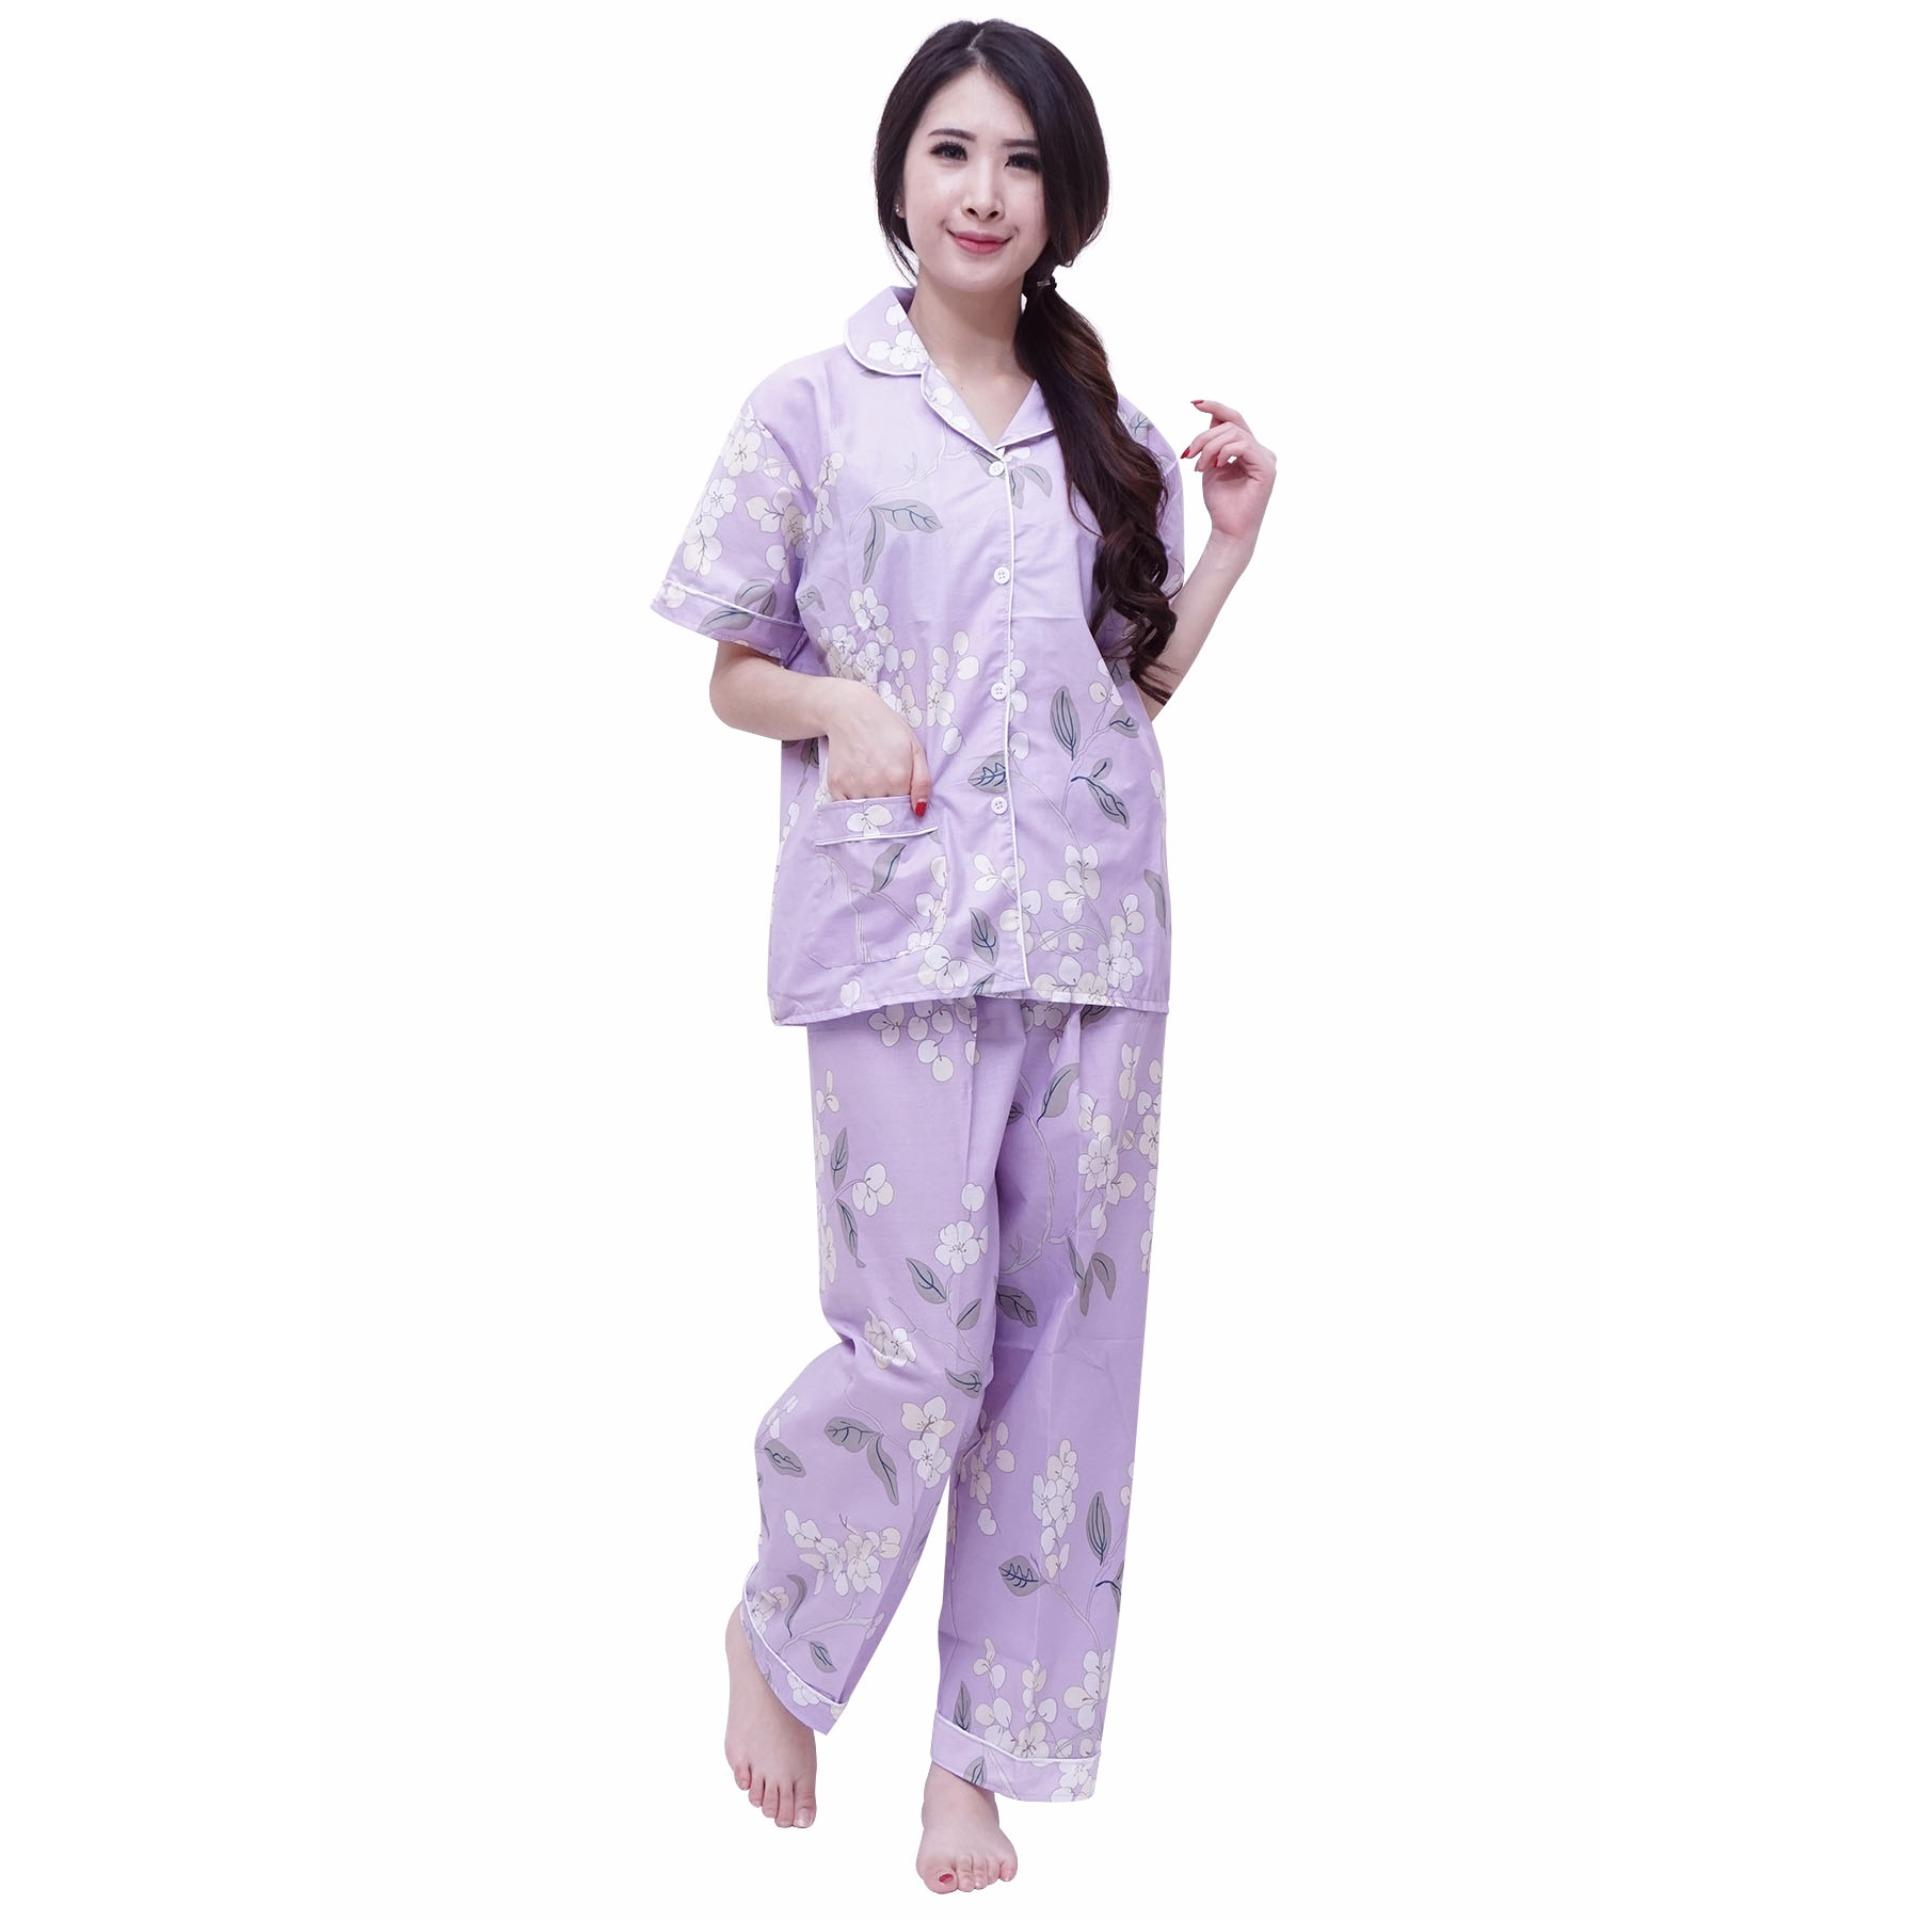 Jual Quincy Baju Tidur Freya Piyama Celana Panjang Purple Quincylabel